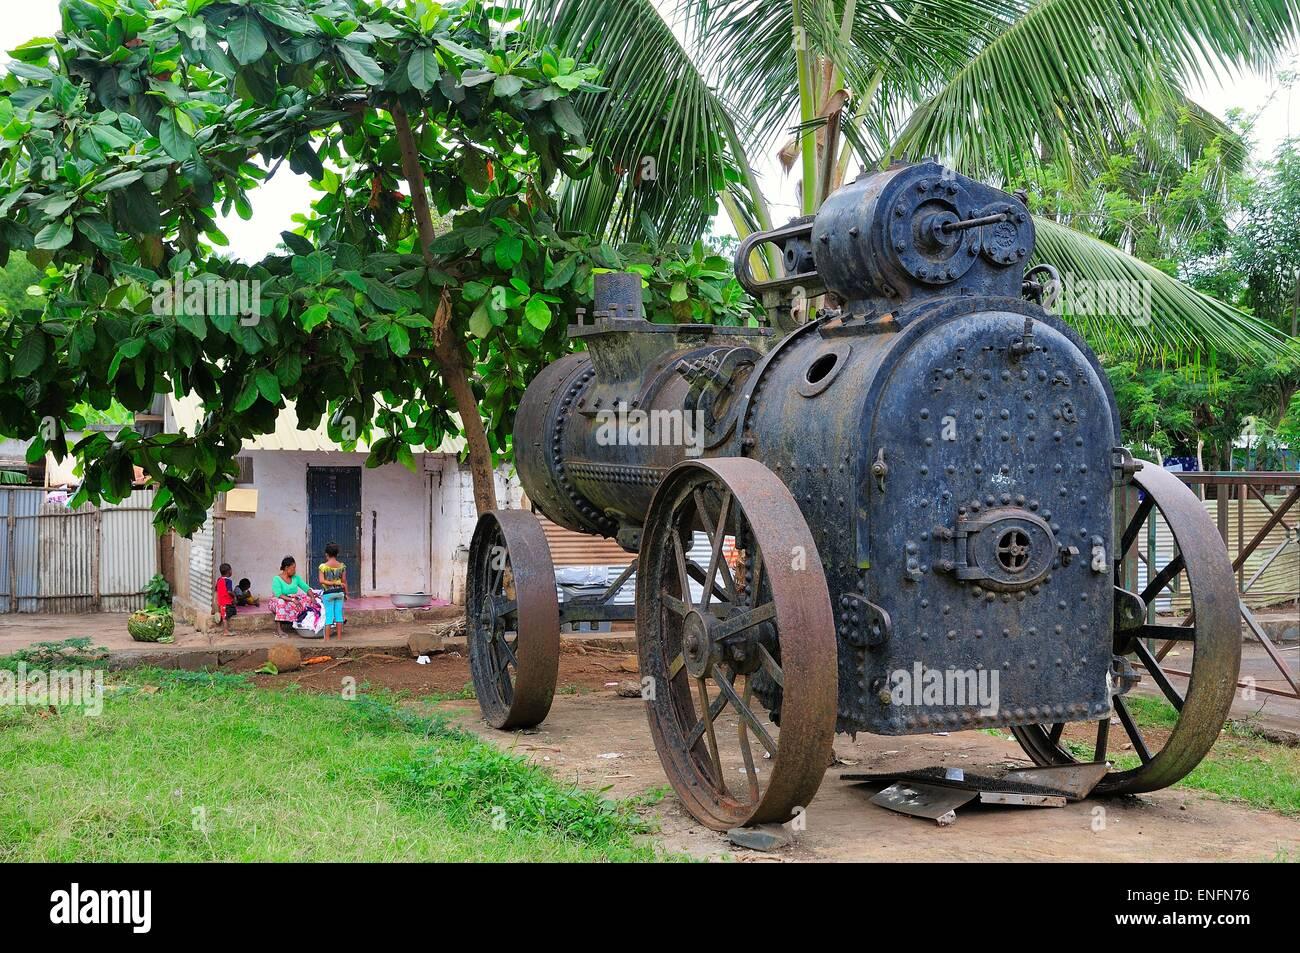 Old steam engine, Mamoudzou, Mayotte - Stock Image